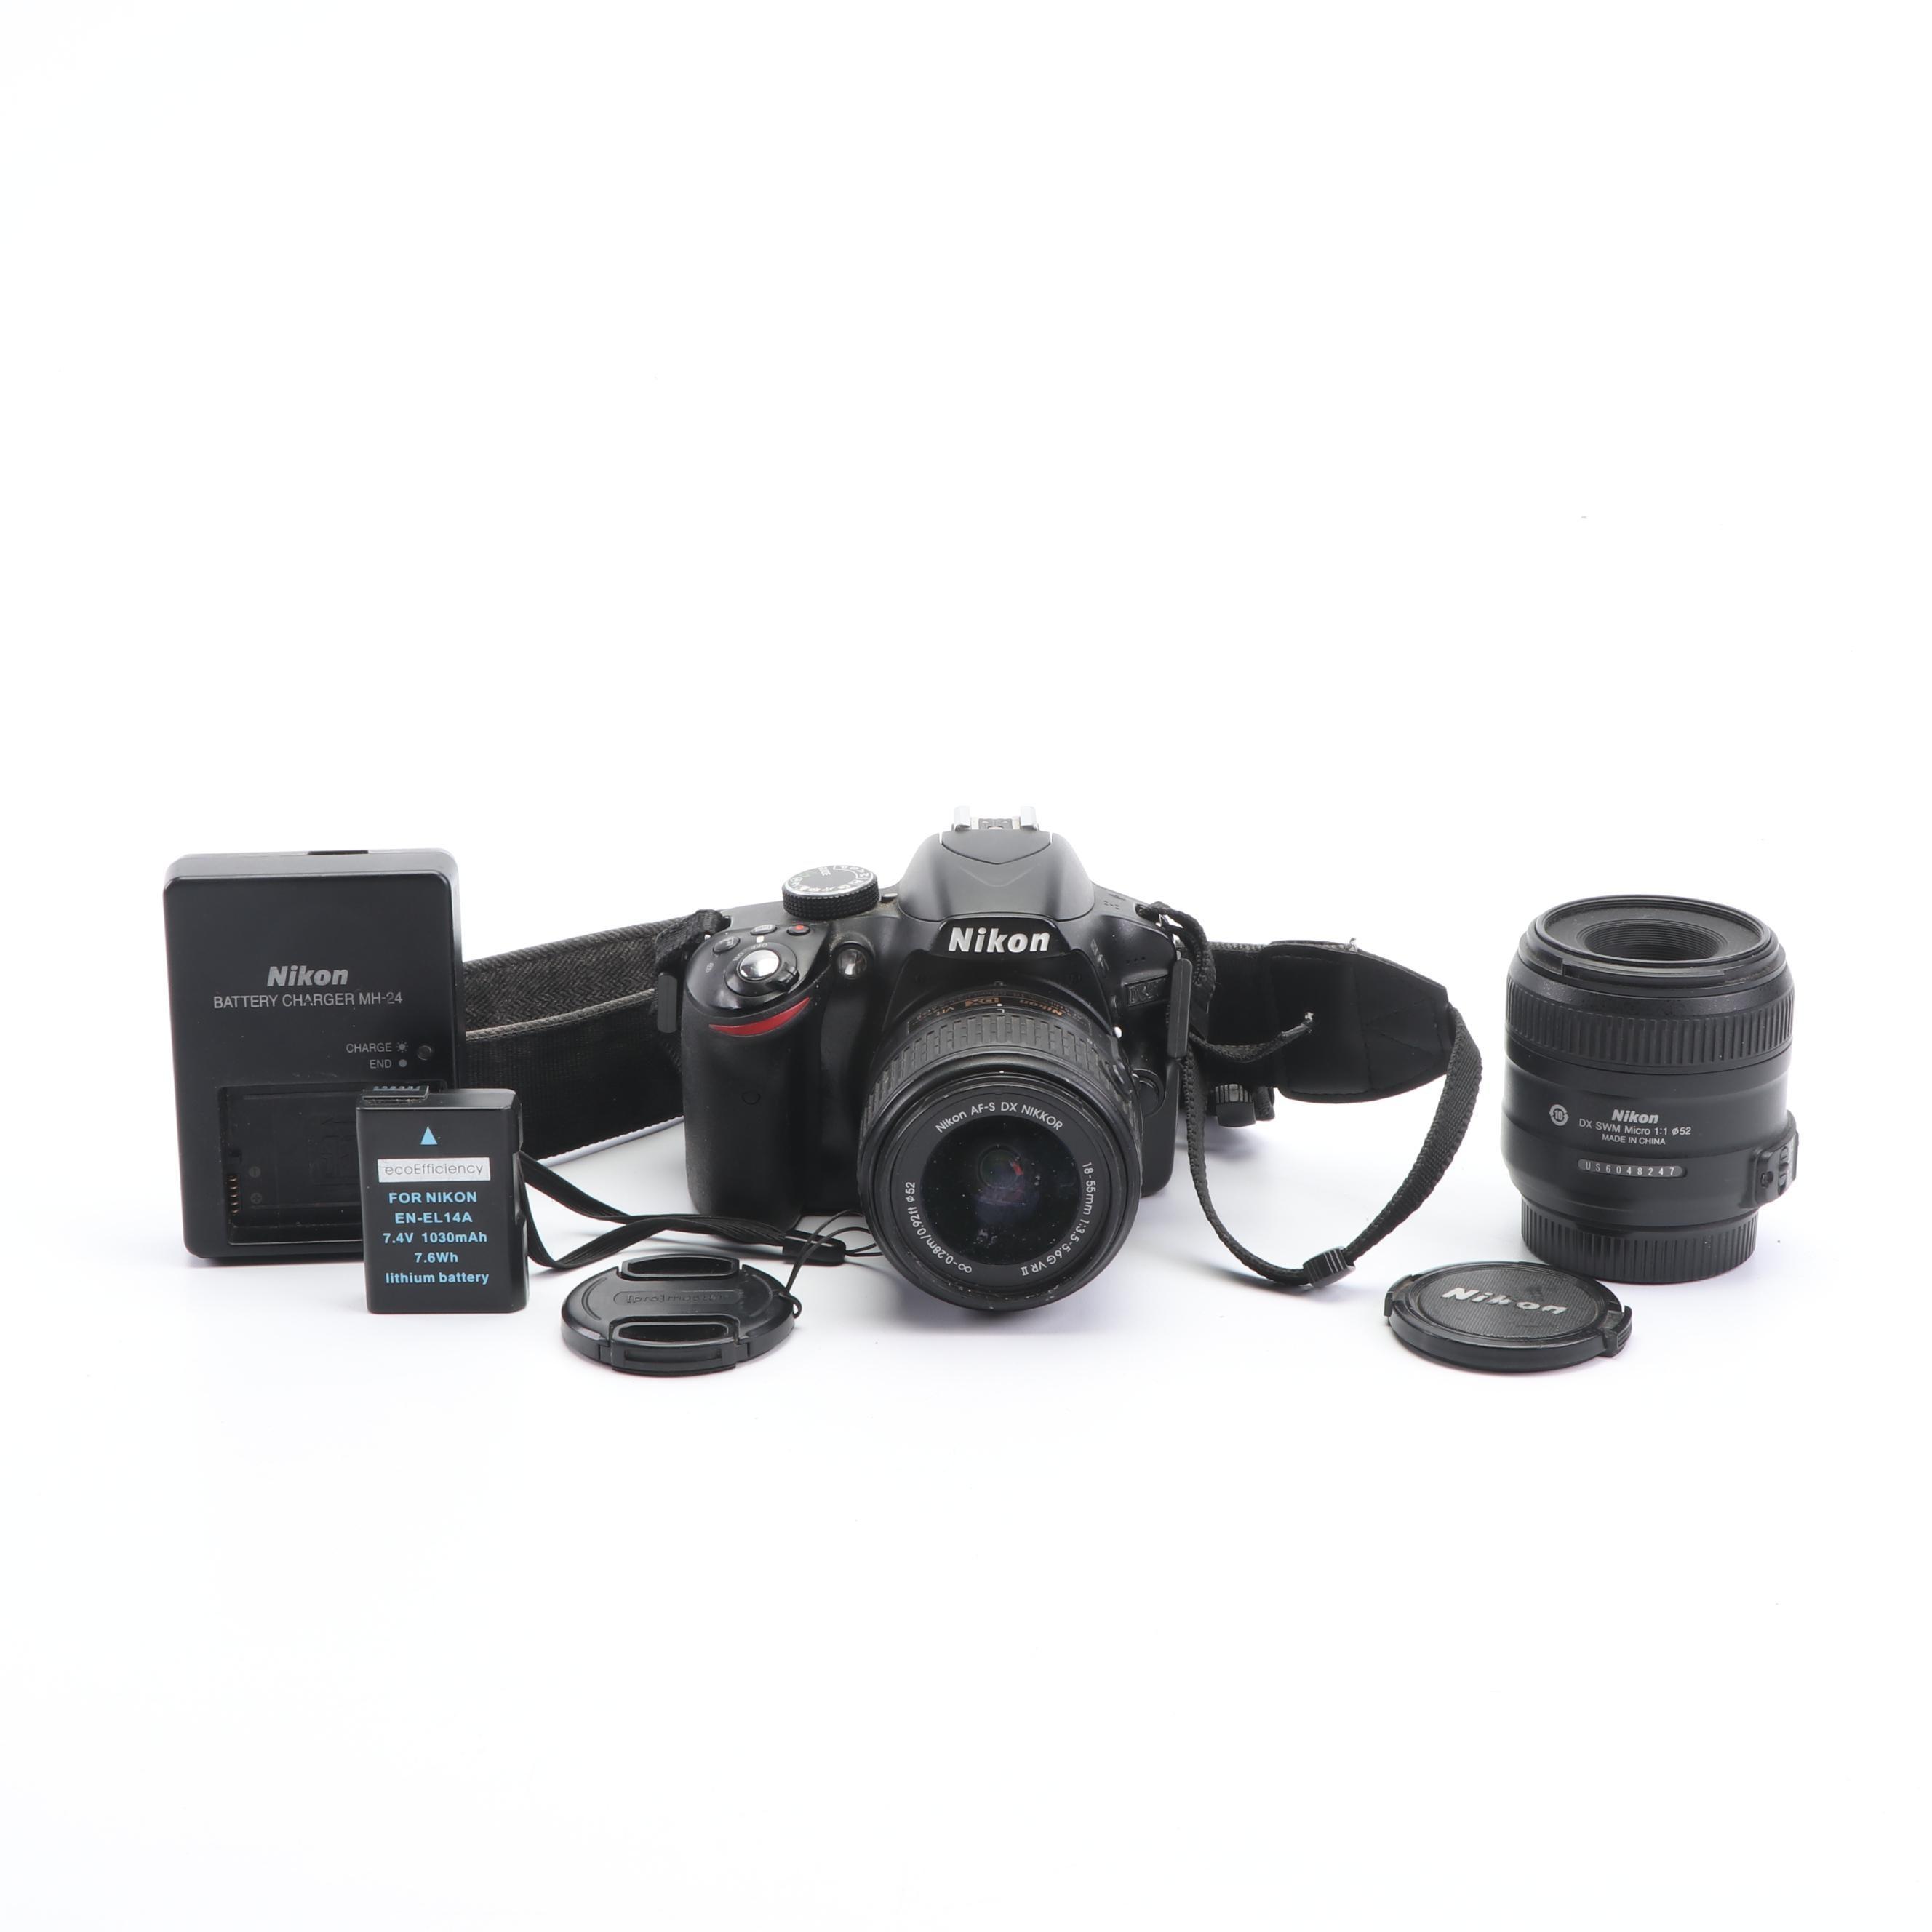 Nikon D3200 DSLR Camera and Lenses